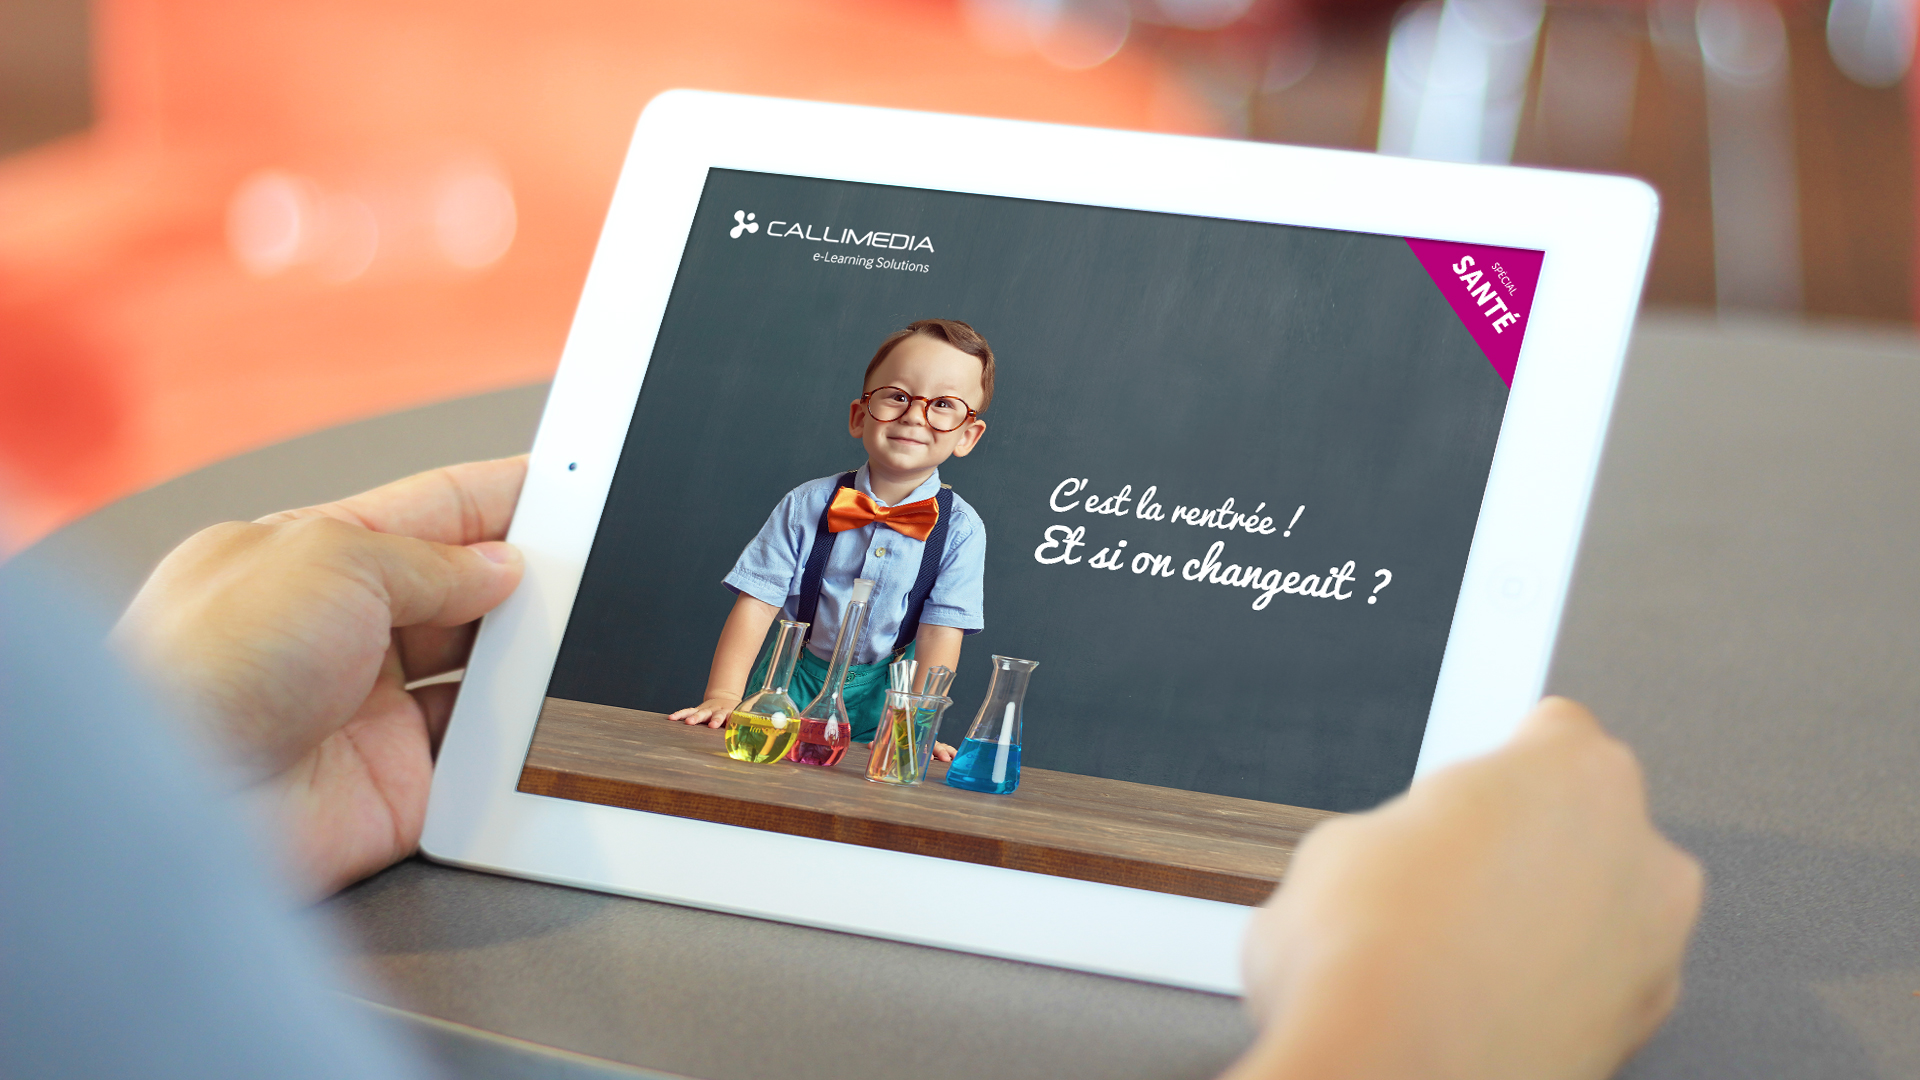 callimedia-creation-newsletter-mailing-graphique-caconcept-alexis-cretin-graphiste-montpellier